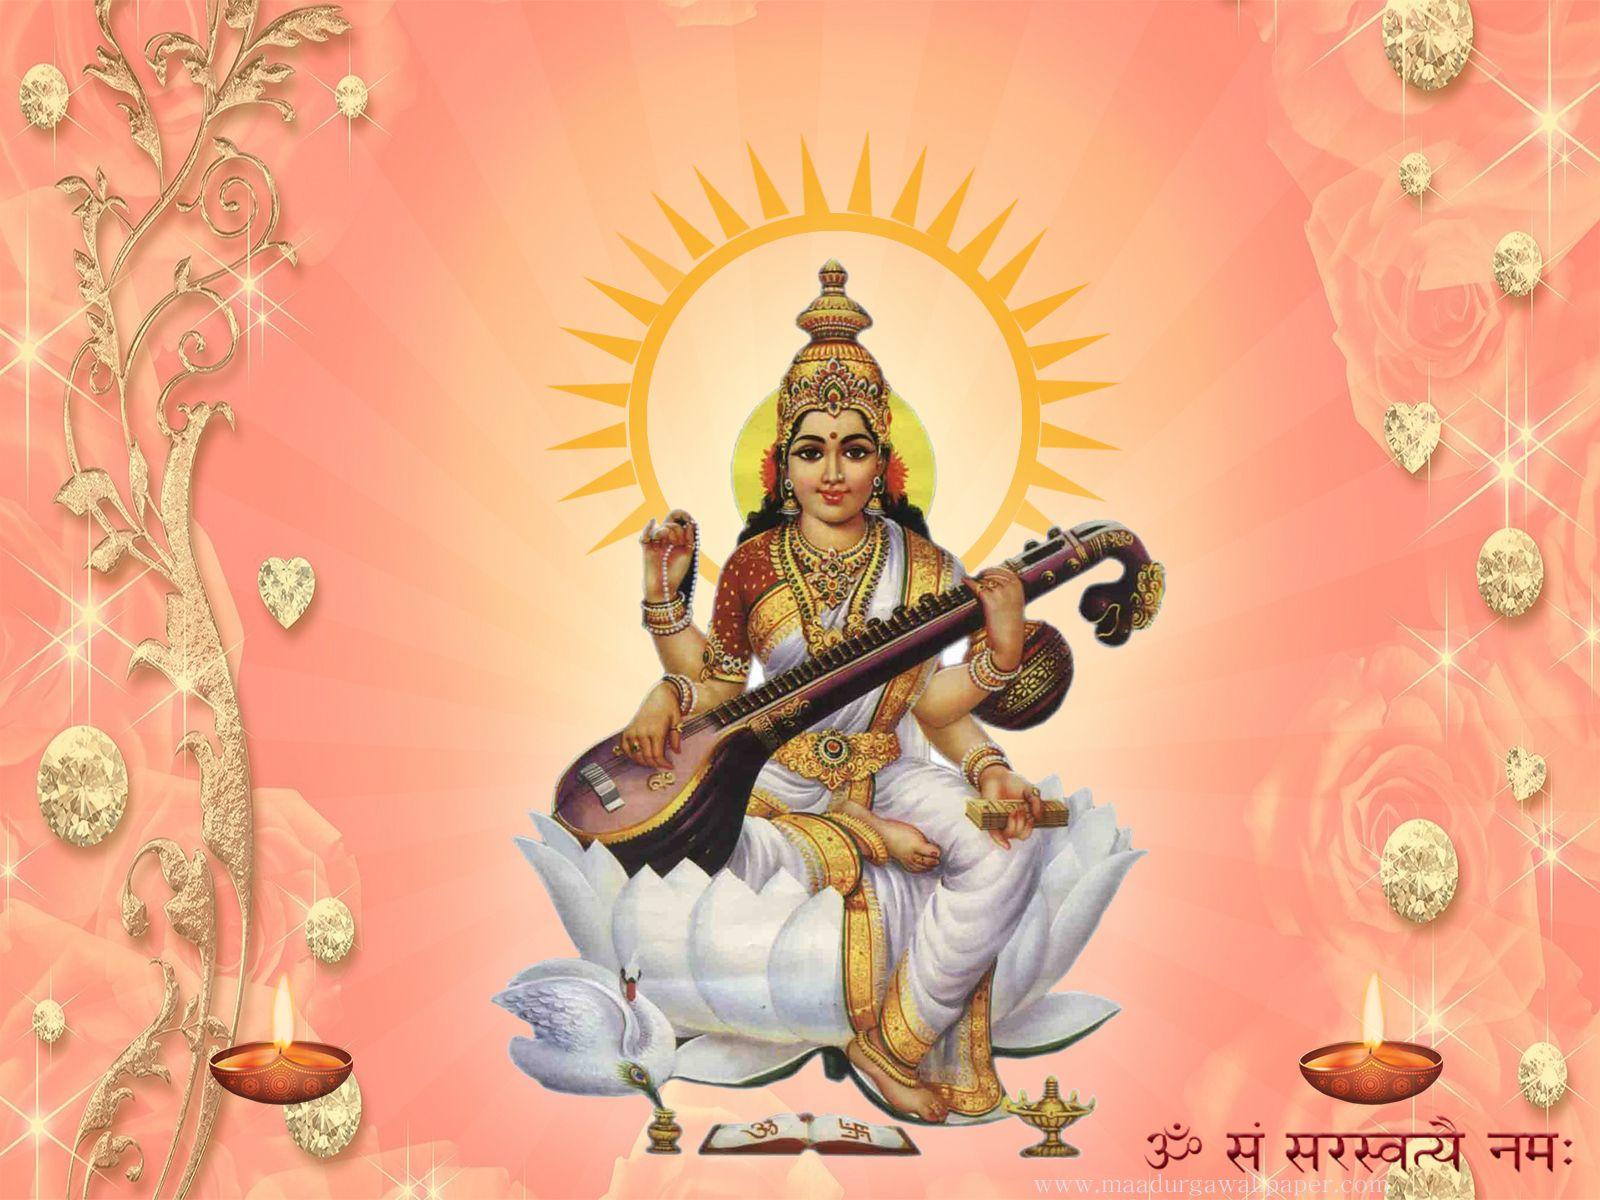 Maa Saraswati Hd Photo Beautiful Images Hd Photos Attractive Wallpapers